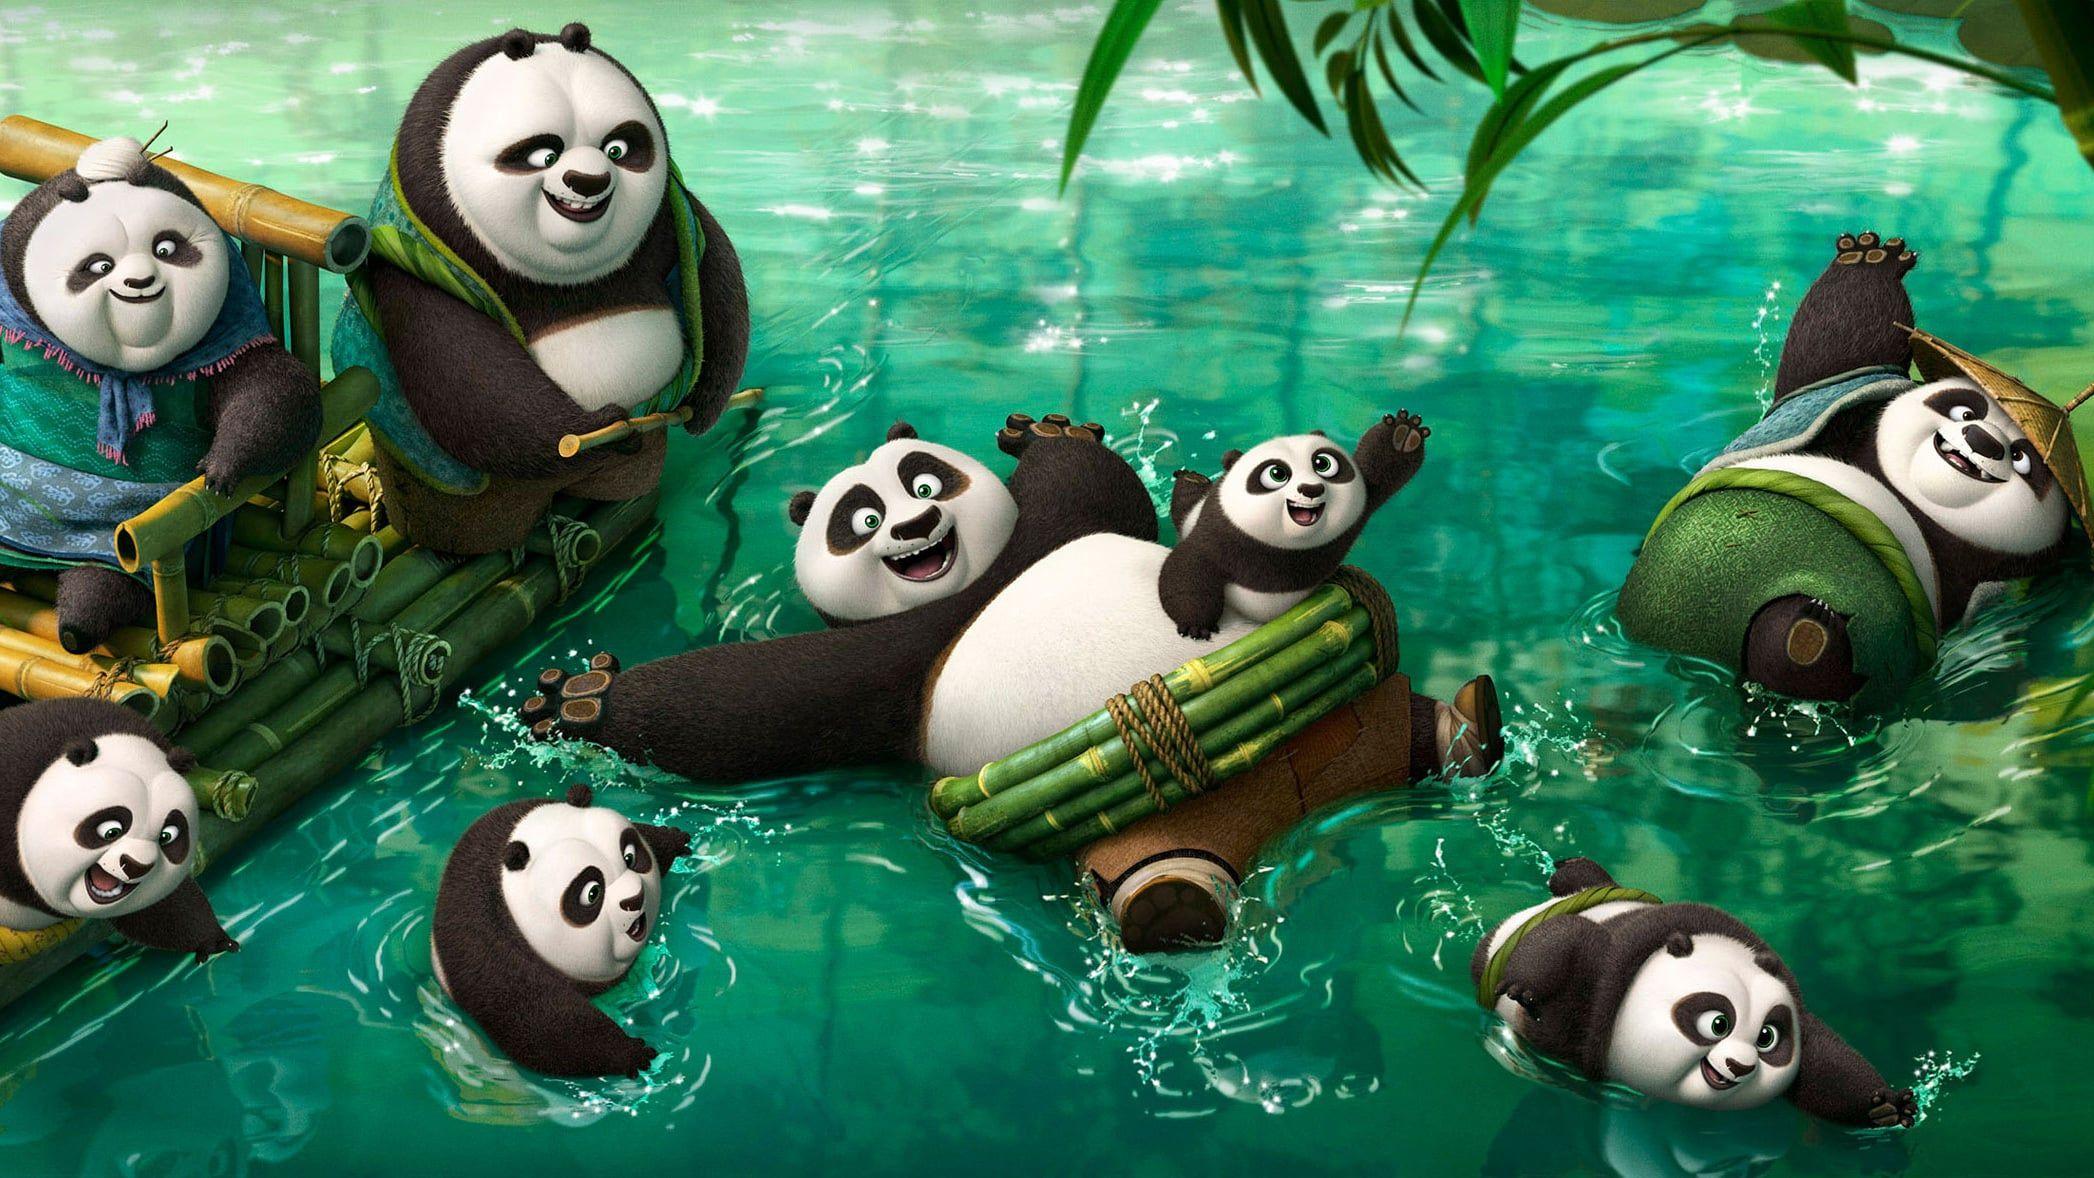 Kung Fu Panda 3 Kung Fu Panda 3 Kung Fu Panda Panda Wallpapers